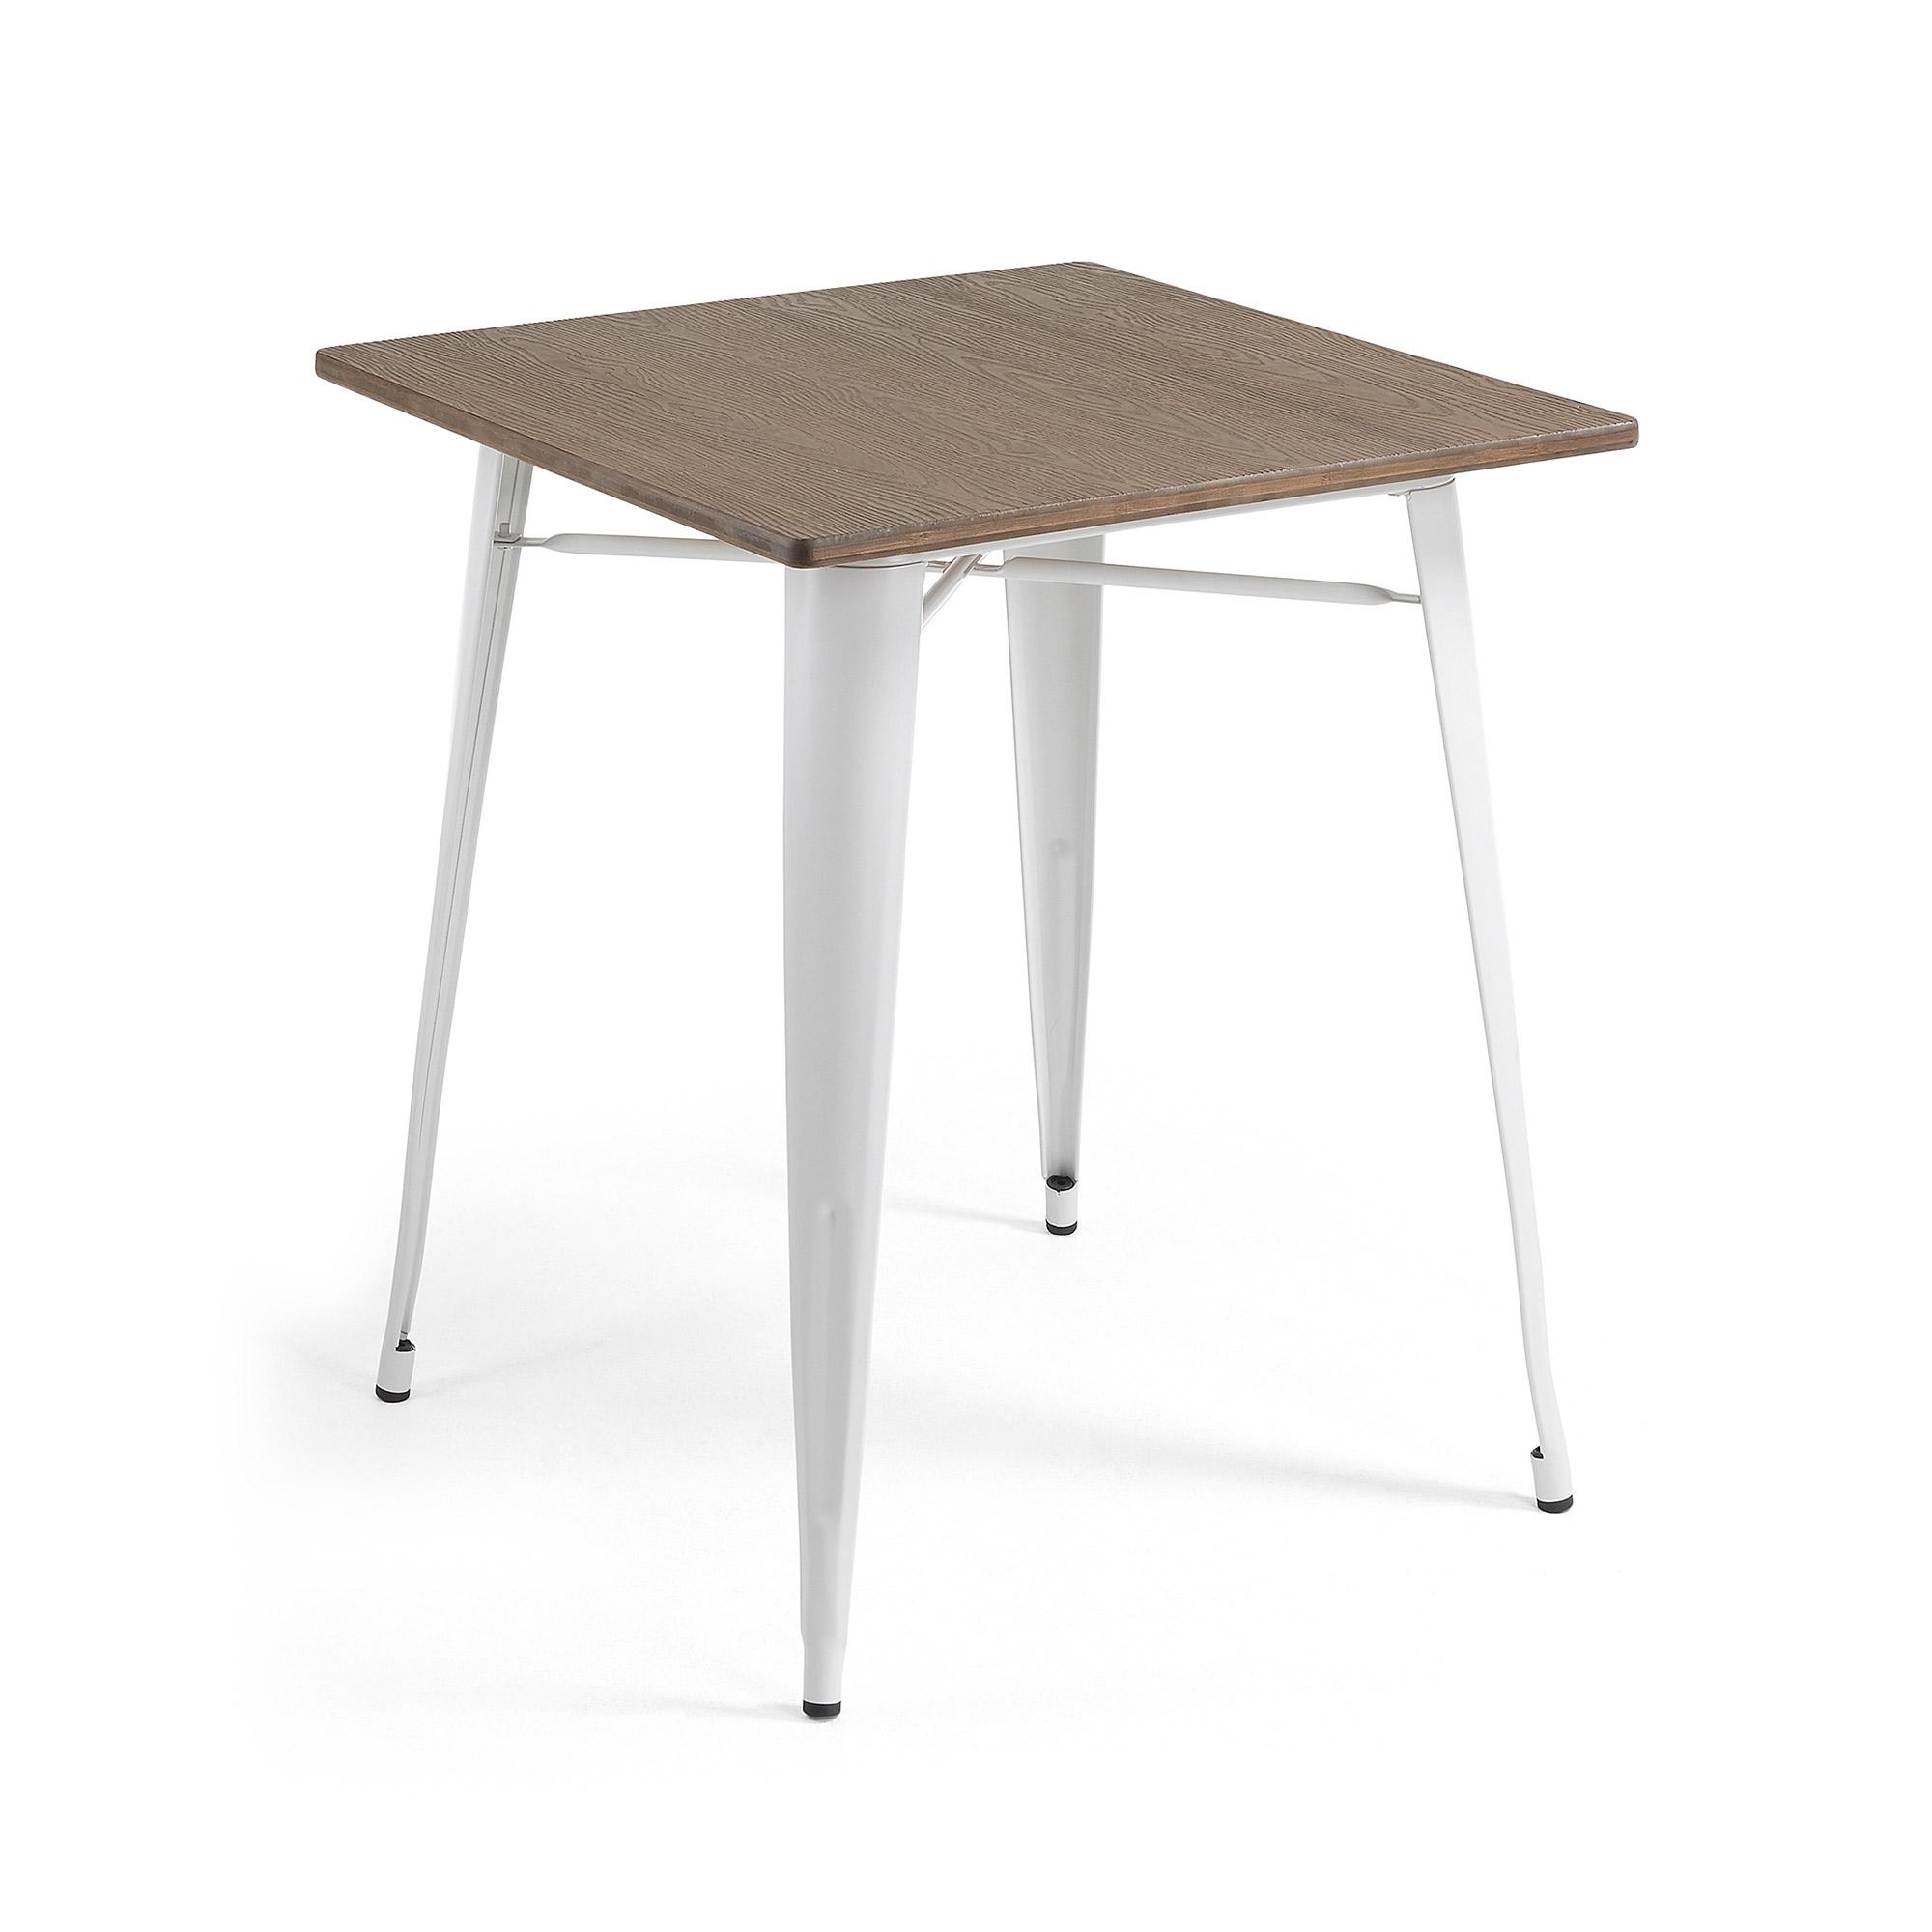 laforma Laforma malibu caf?bord - brun/hvid bambus/stål, kvadratisk (80x80) fra boboonline.dk